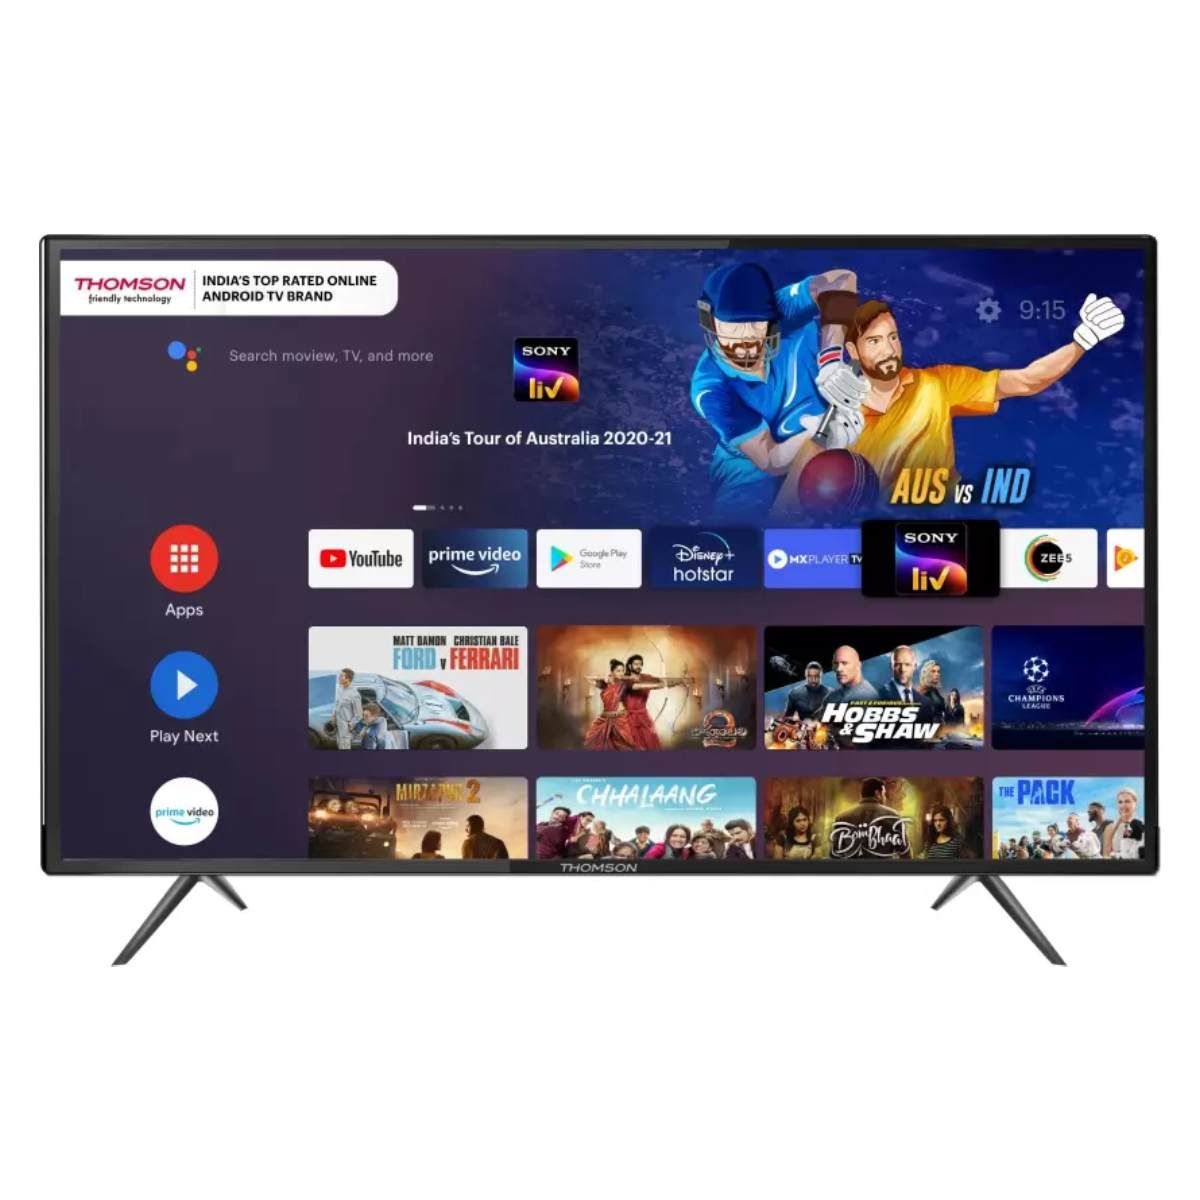 Thomson 9A Series 40 அங்குலம் Full HD LED Smart ஆன்ட்ராய்ட் TV(40PATH7777)